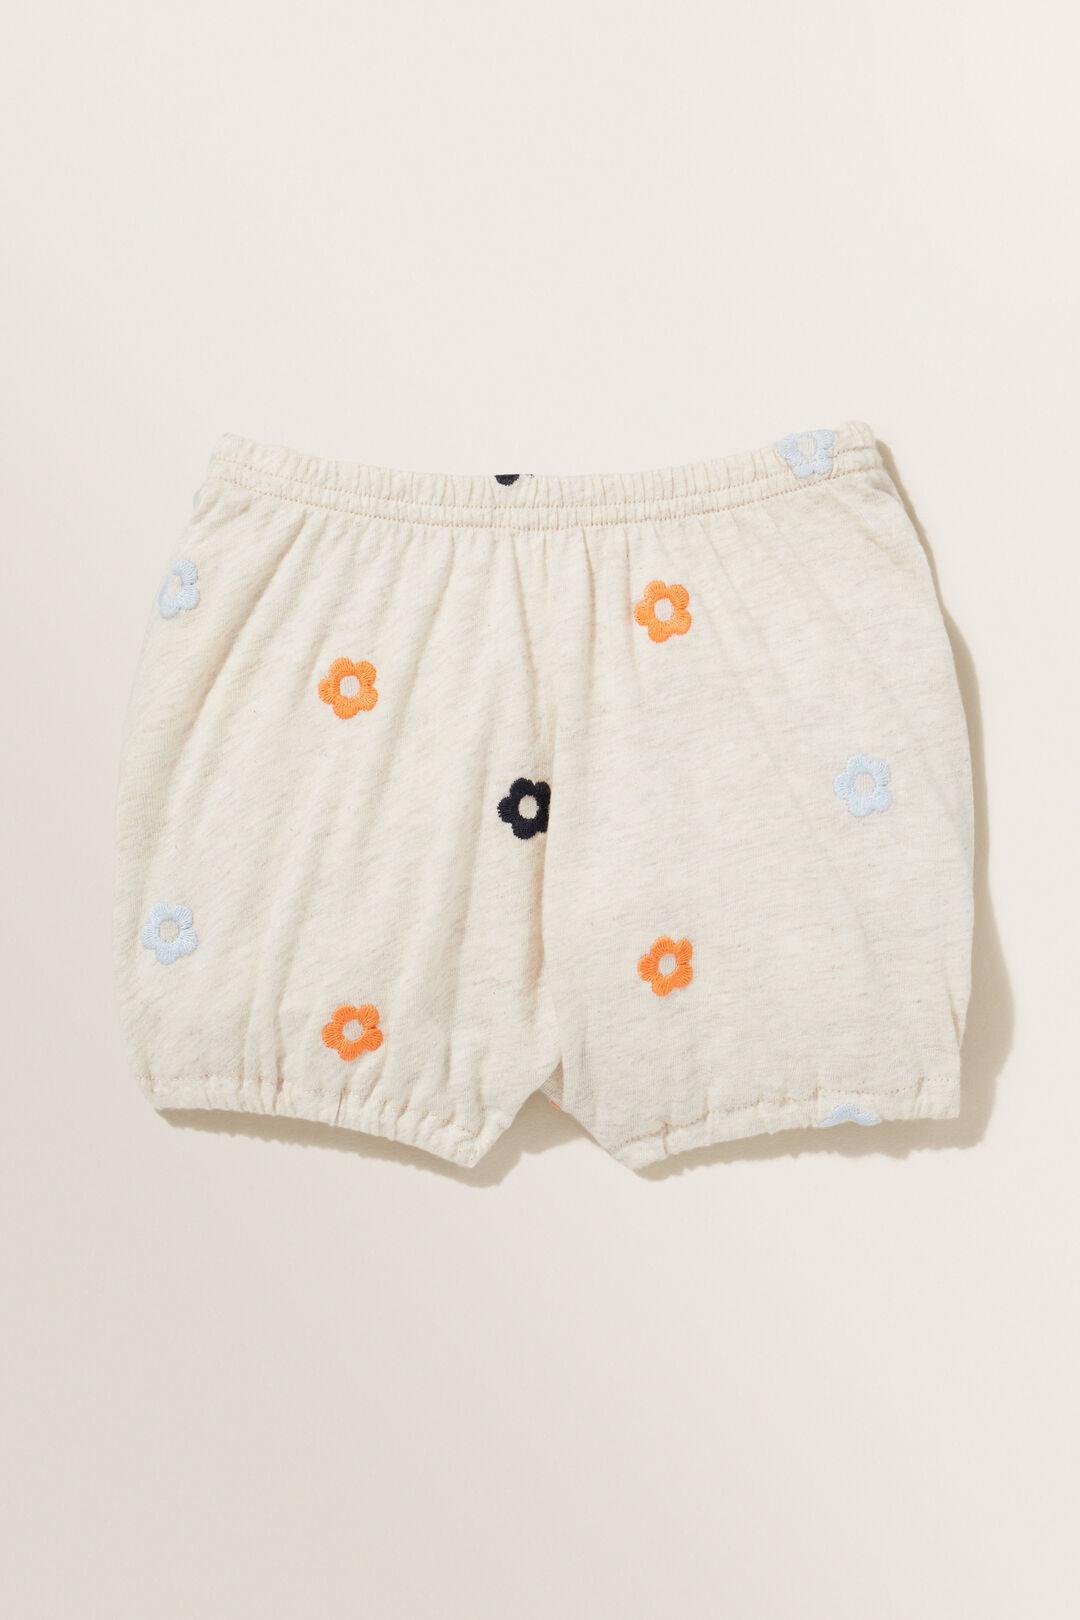 Embroidered Shorts  OAT MARLE  hi-res